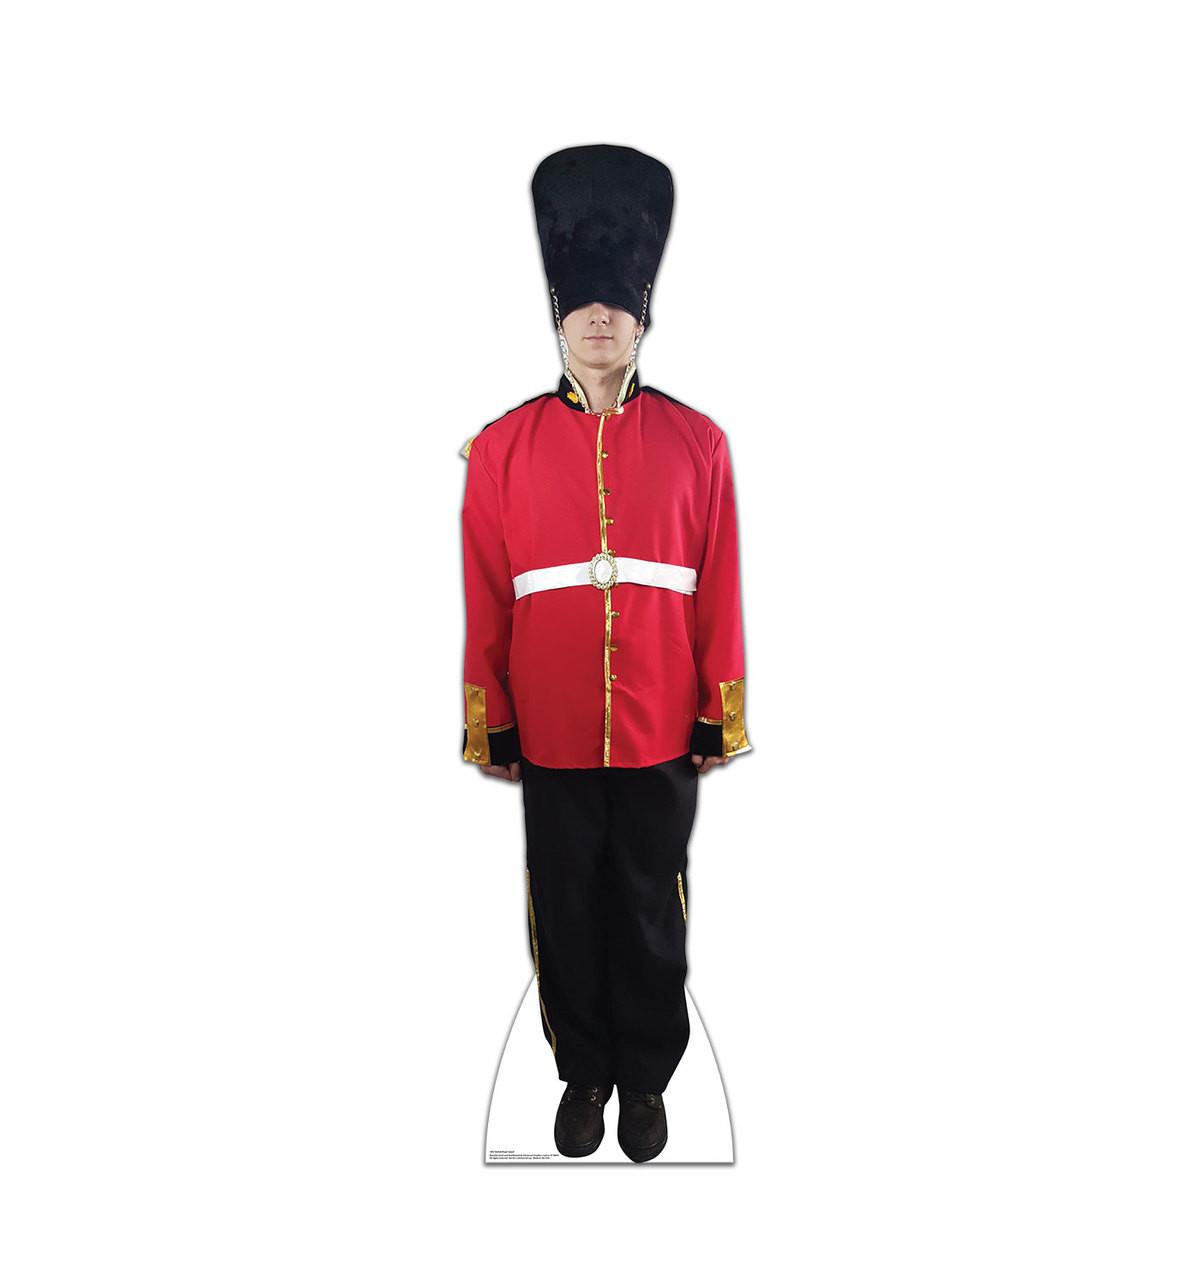 Life-size British Royal Guard Cardboard Standup 2